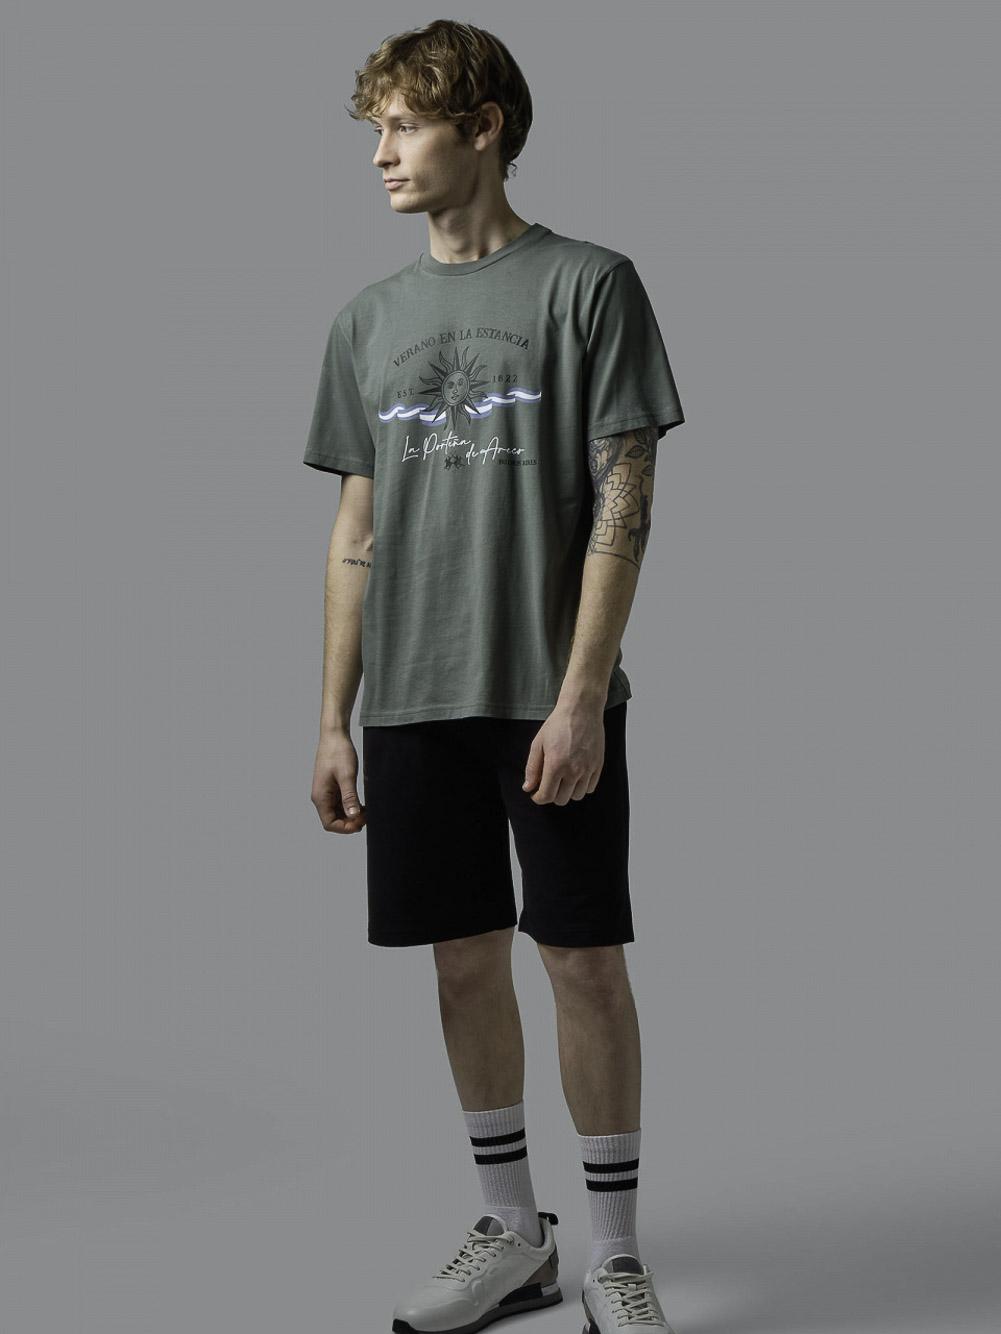 LA MARTINA Μπλούζα t-shirt 3LMRMR015-3208 ΠΡΑΣΙΝΟ